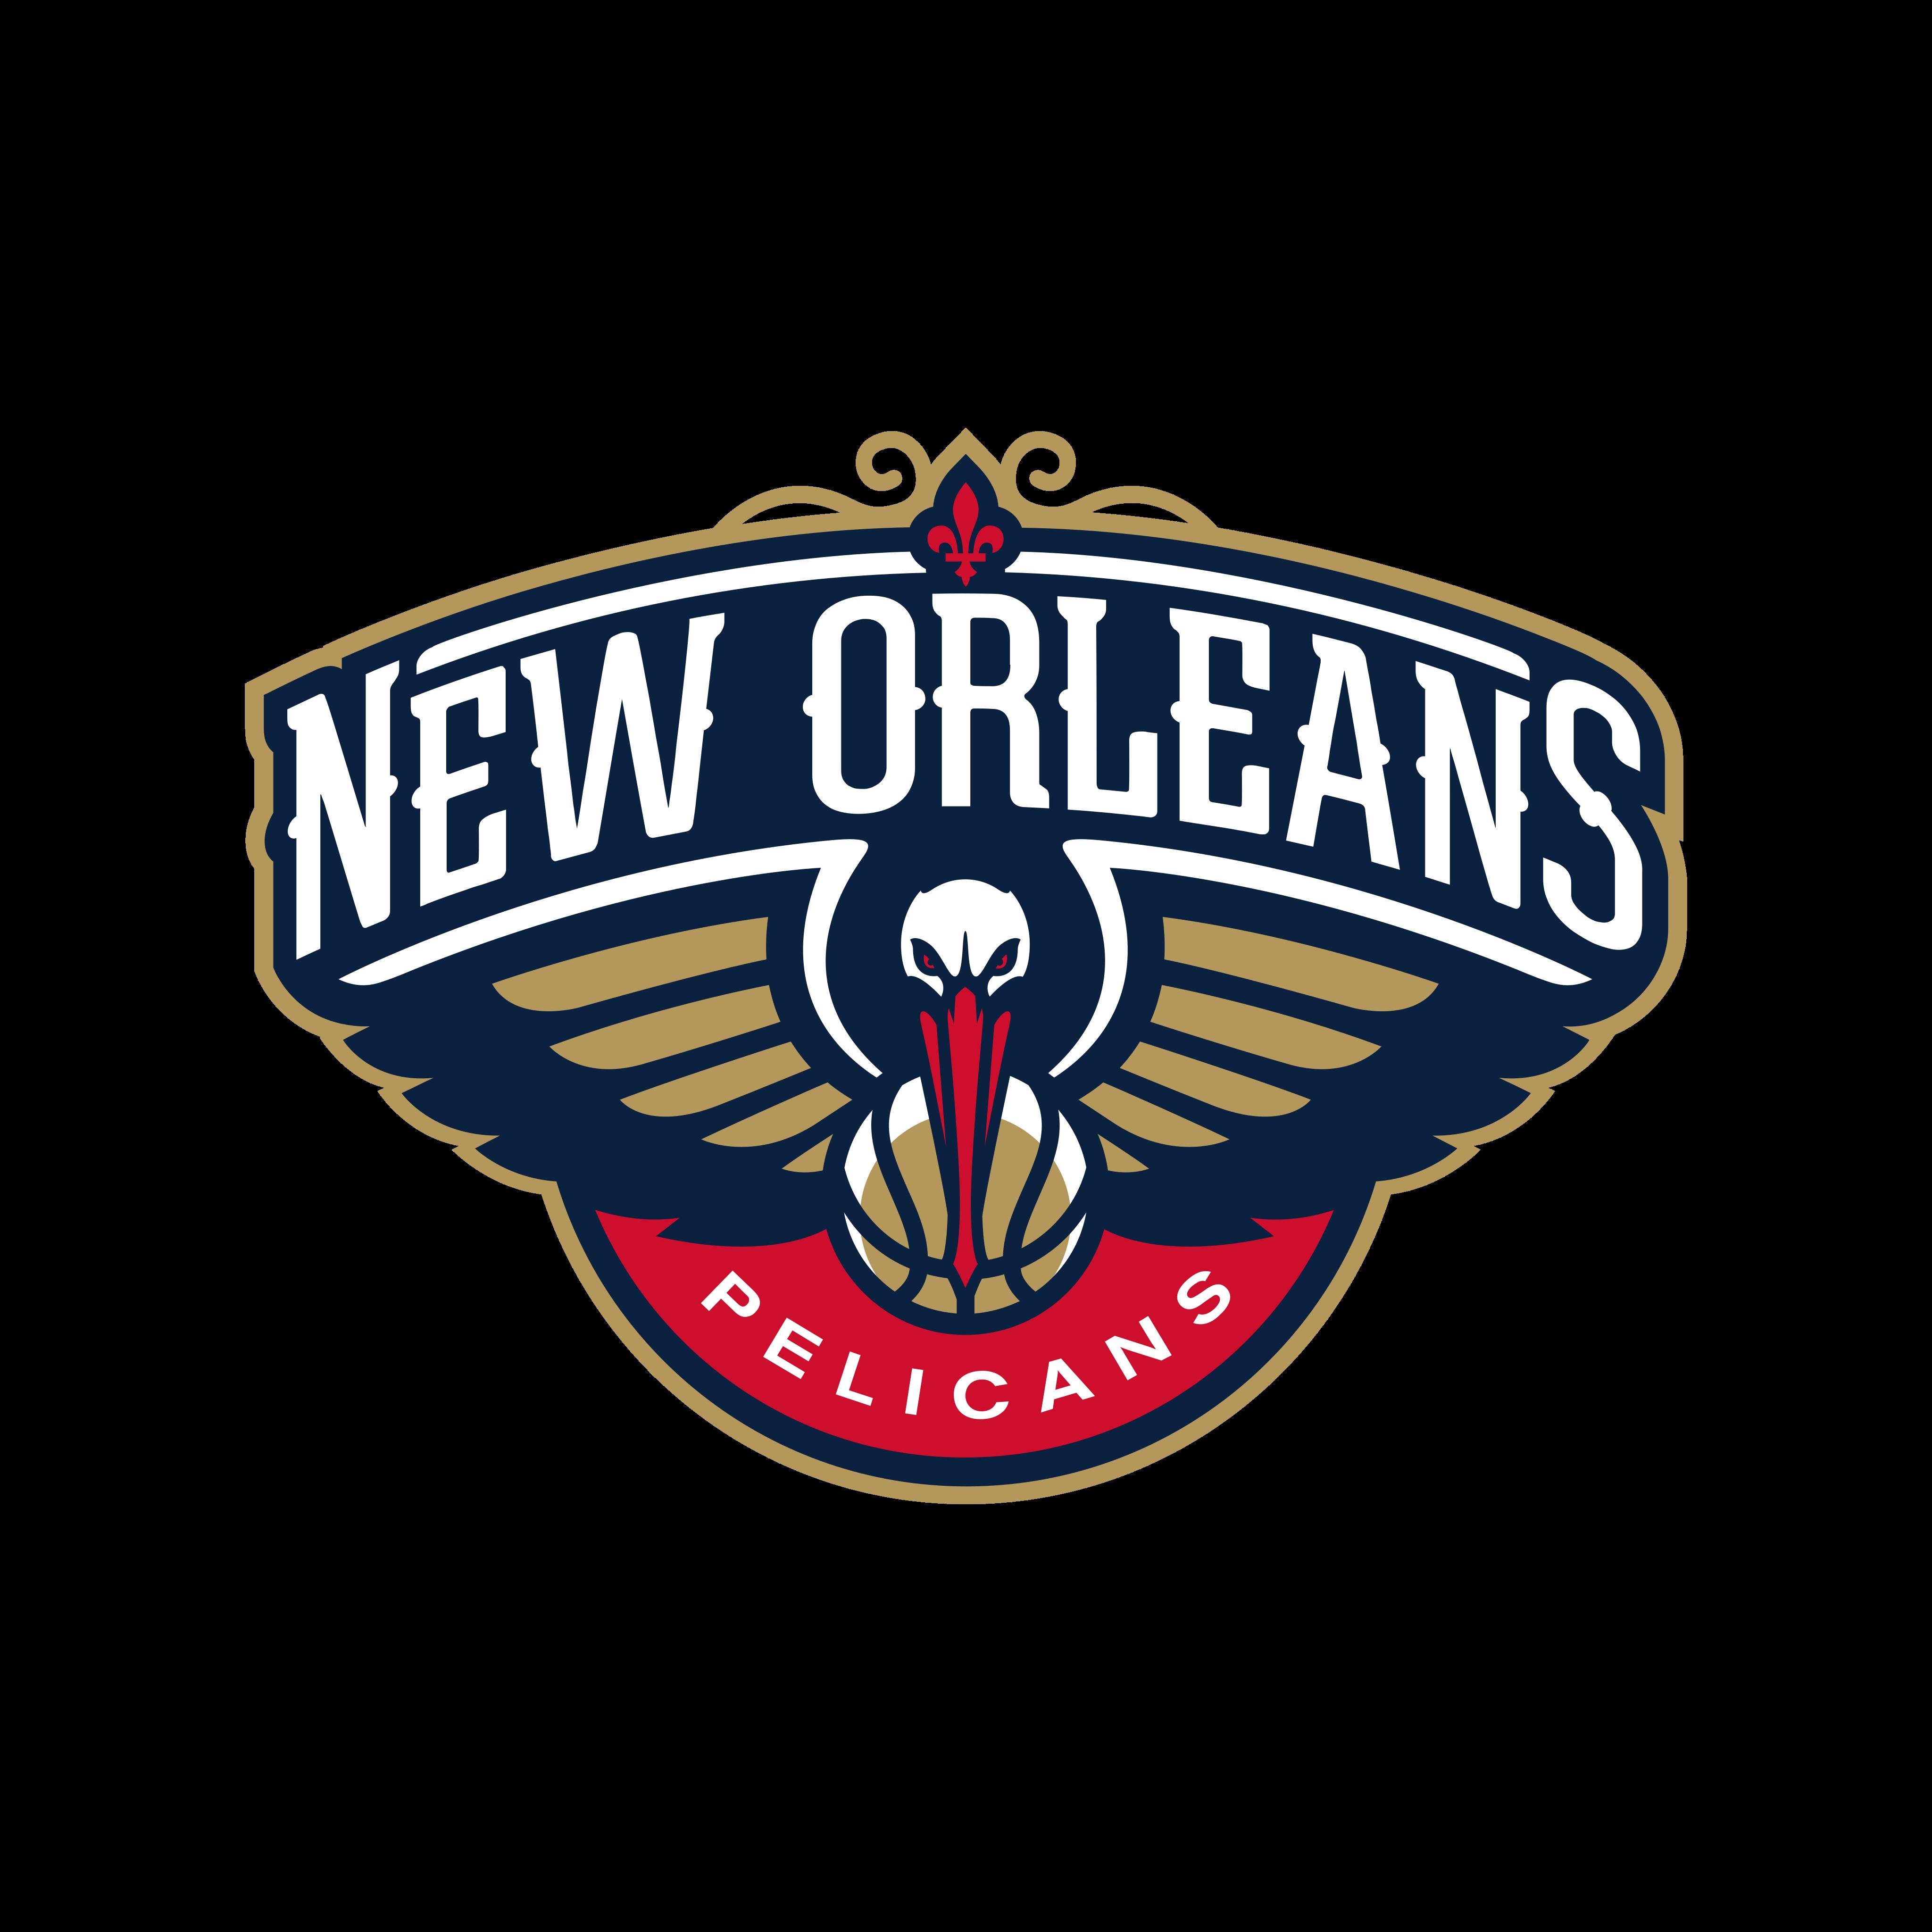 new orleans pelicans logo 0 - New Orleans Pelicans Logo